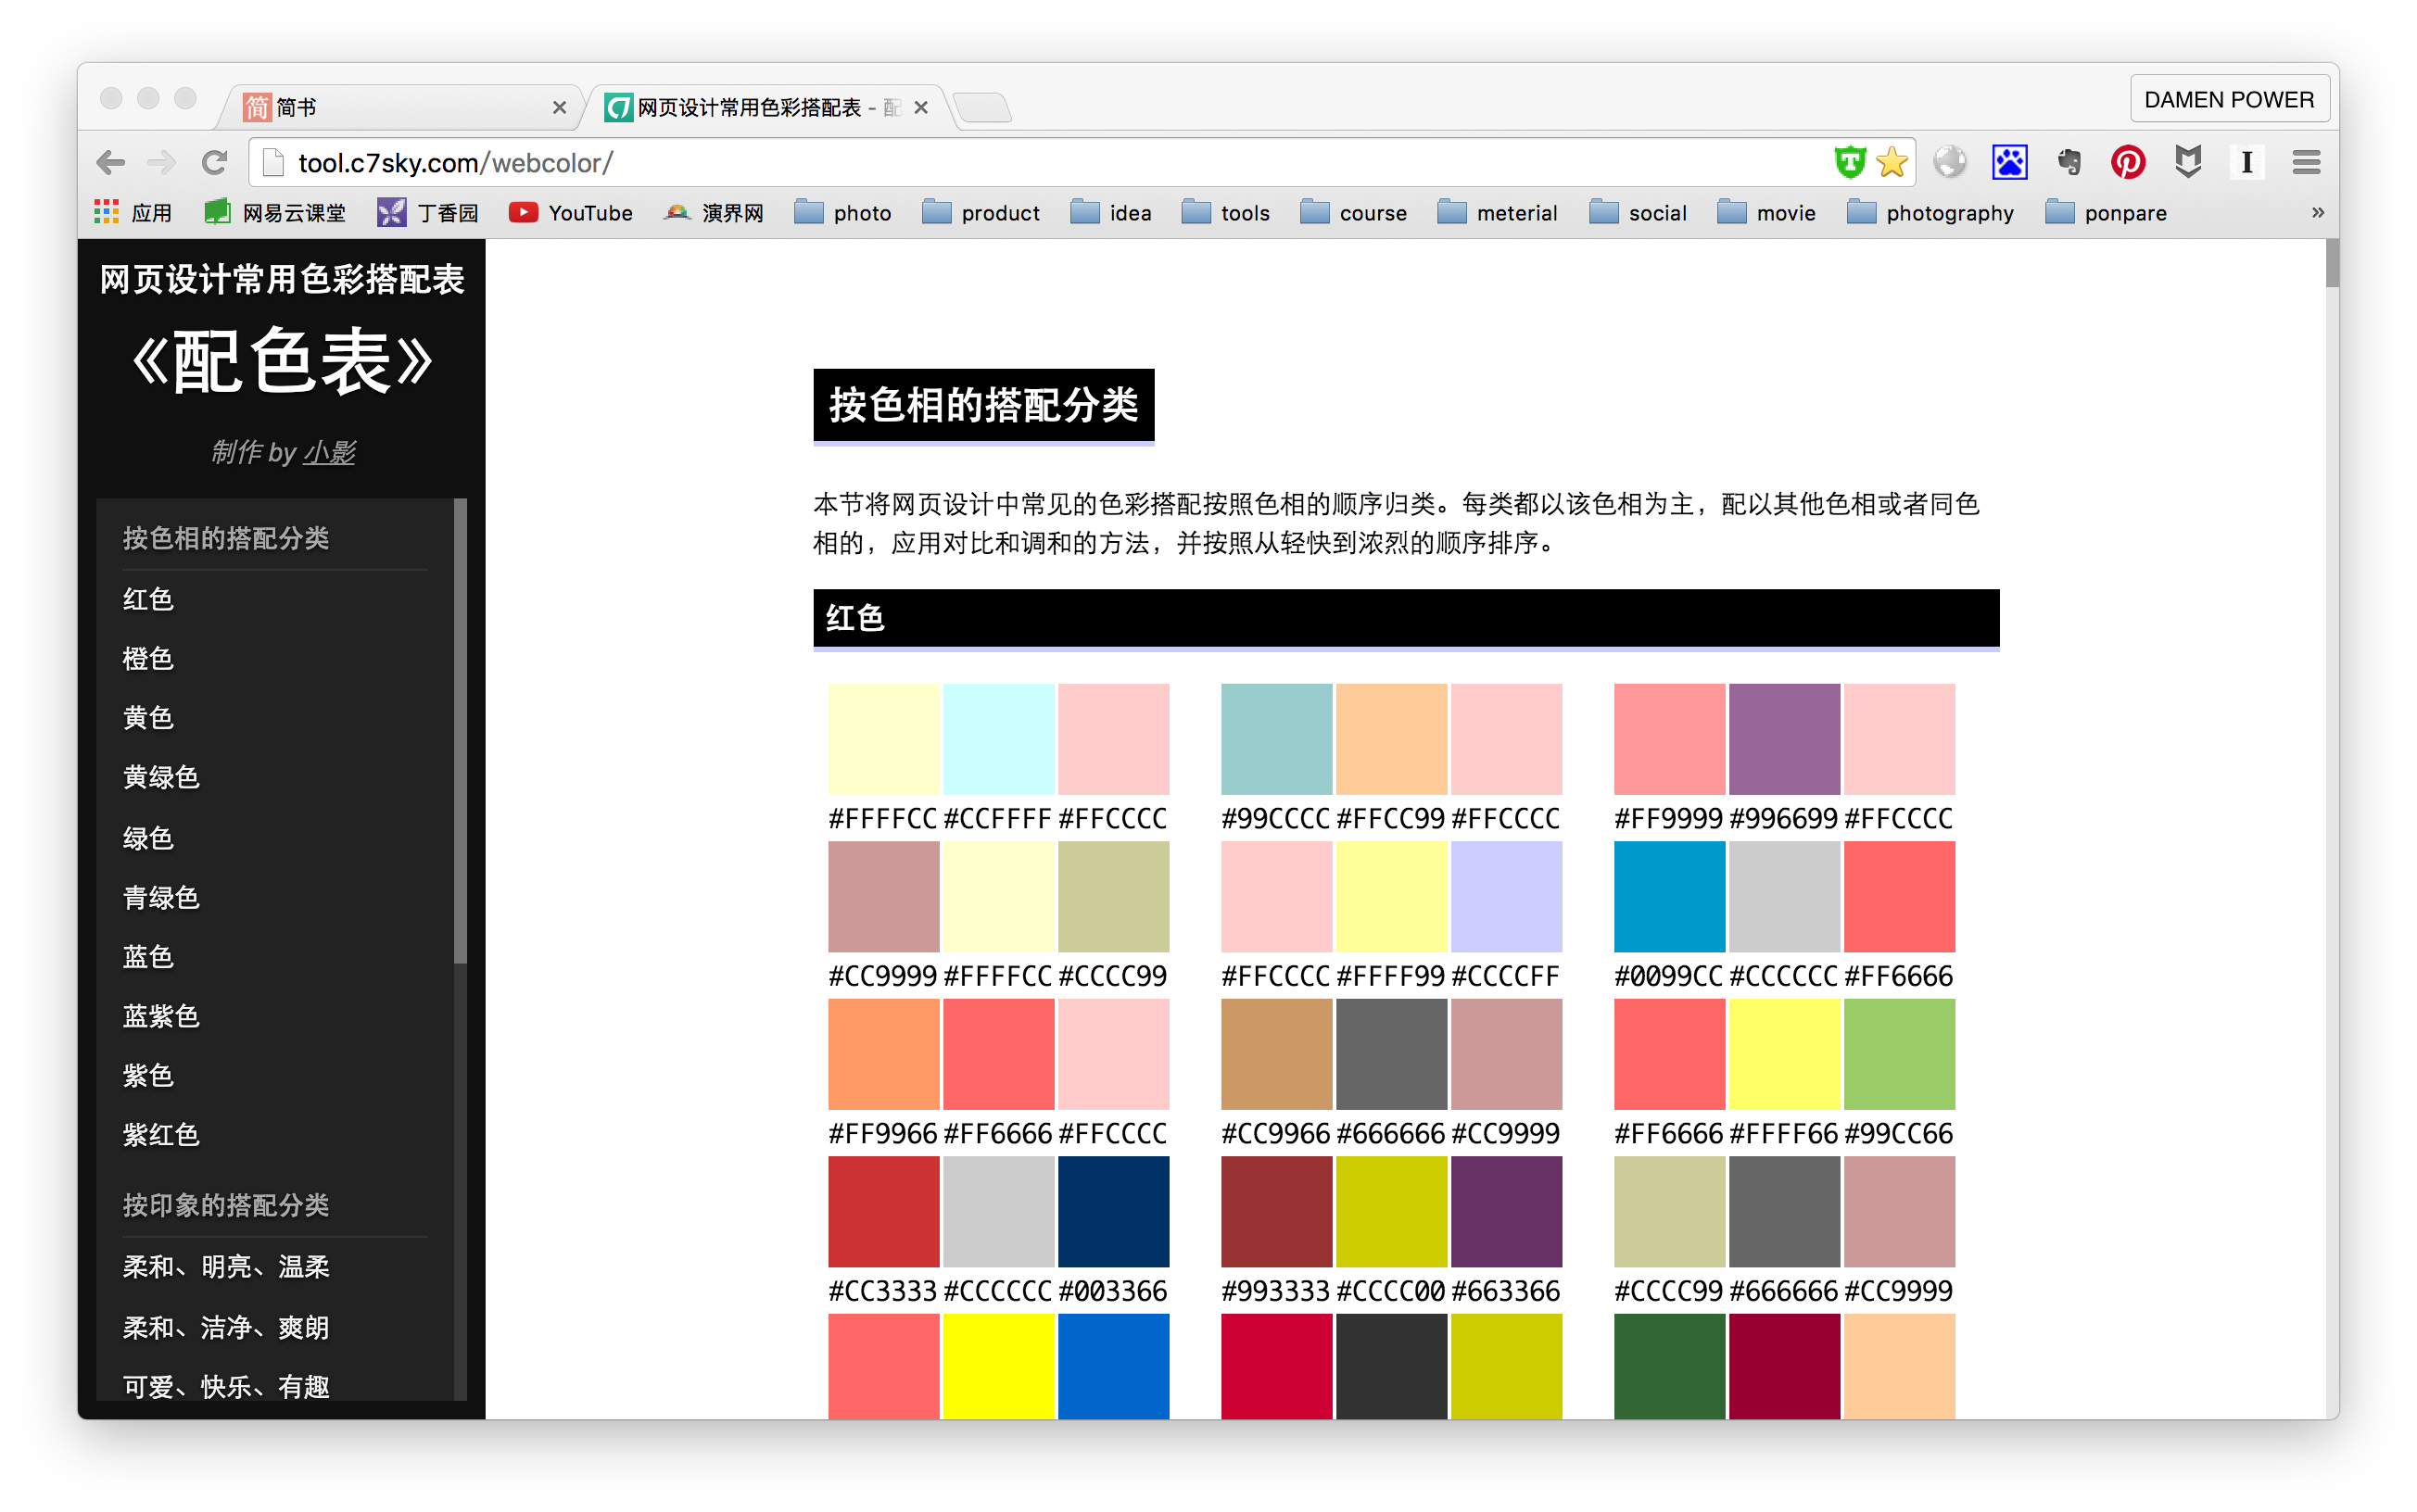 PPT素材PPT配色及网页设计常用色彩搭配网站推荐